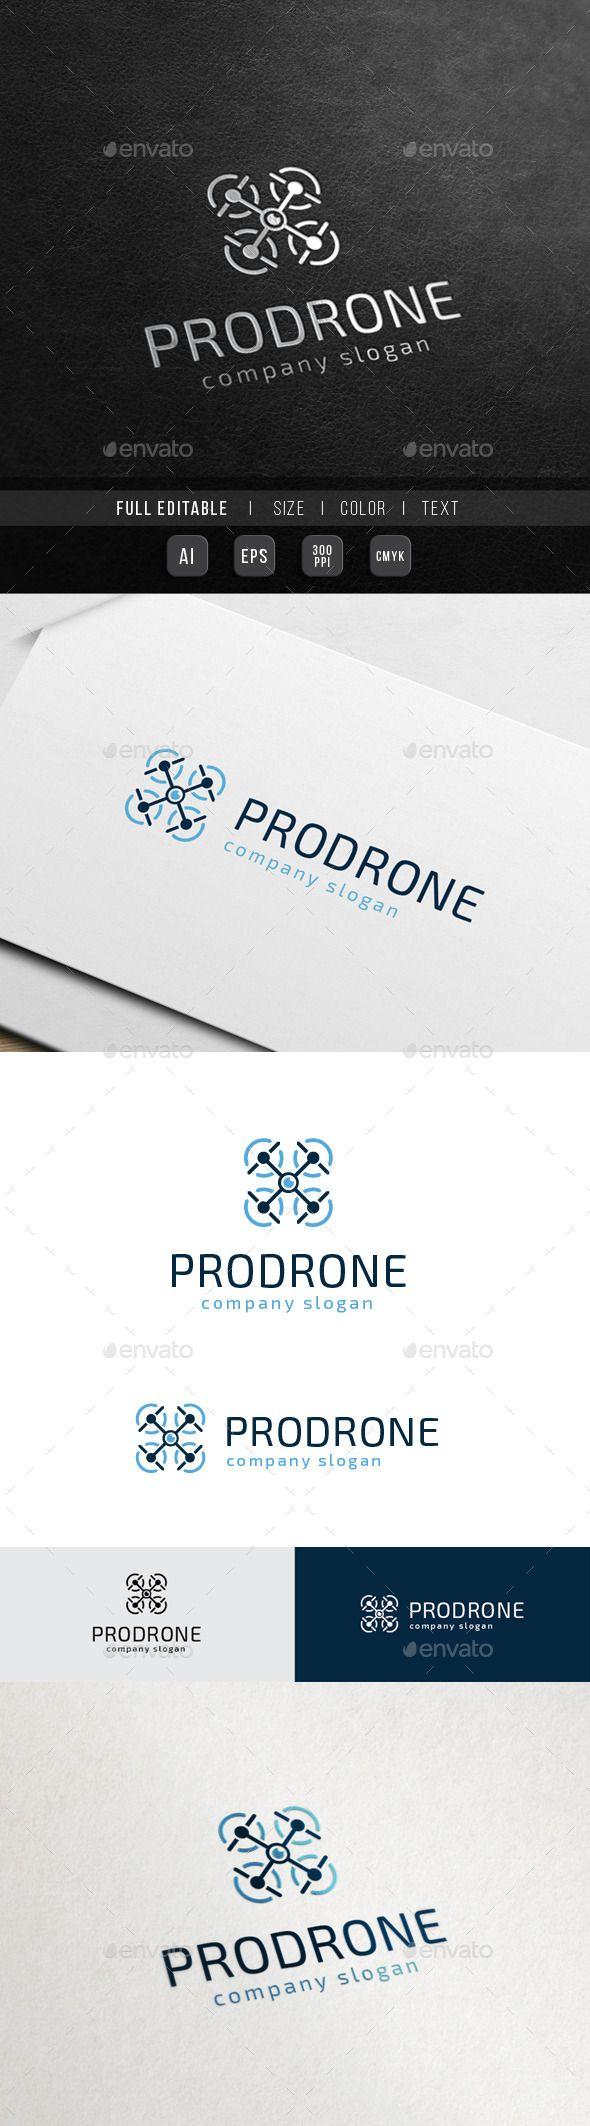 23 best logos images on pinterest logos drones and logo designing pro drone drone camera logo design